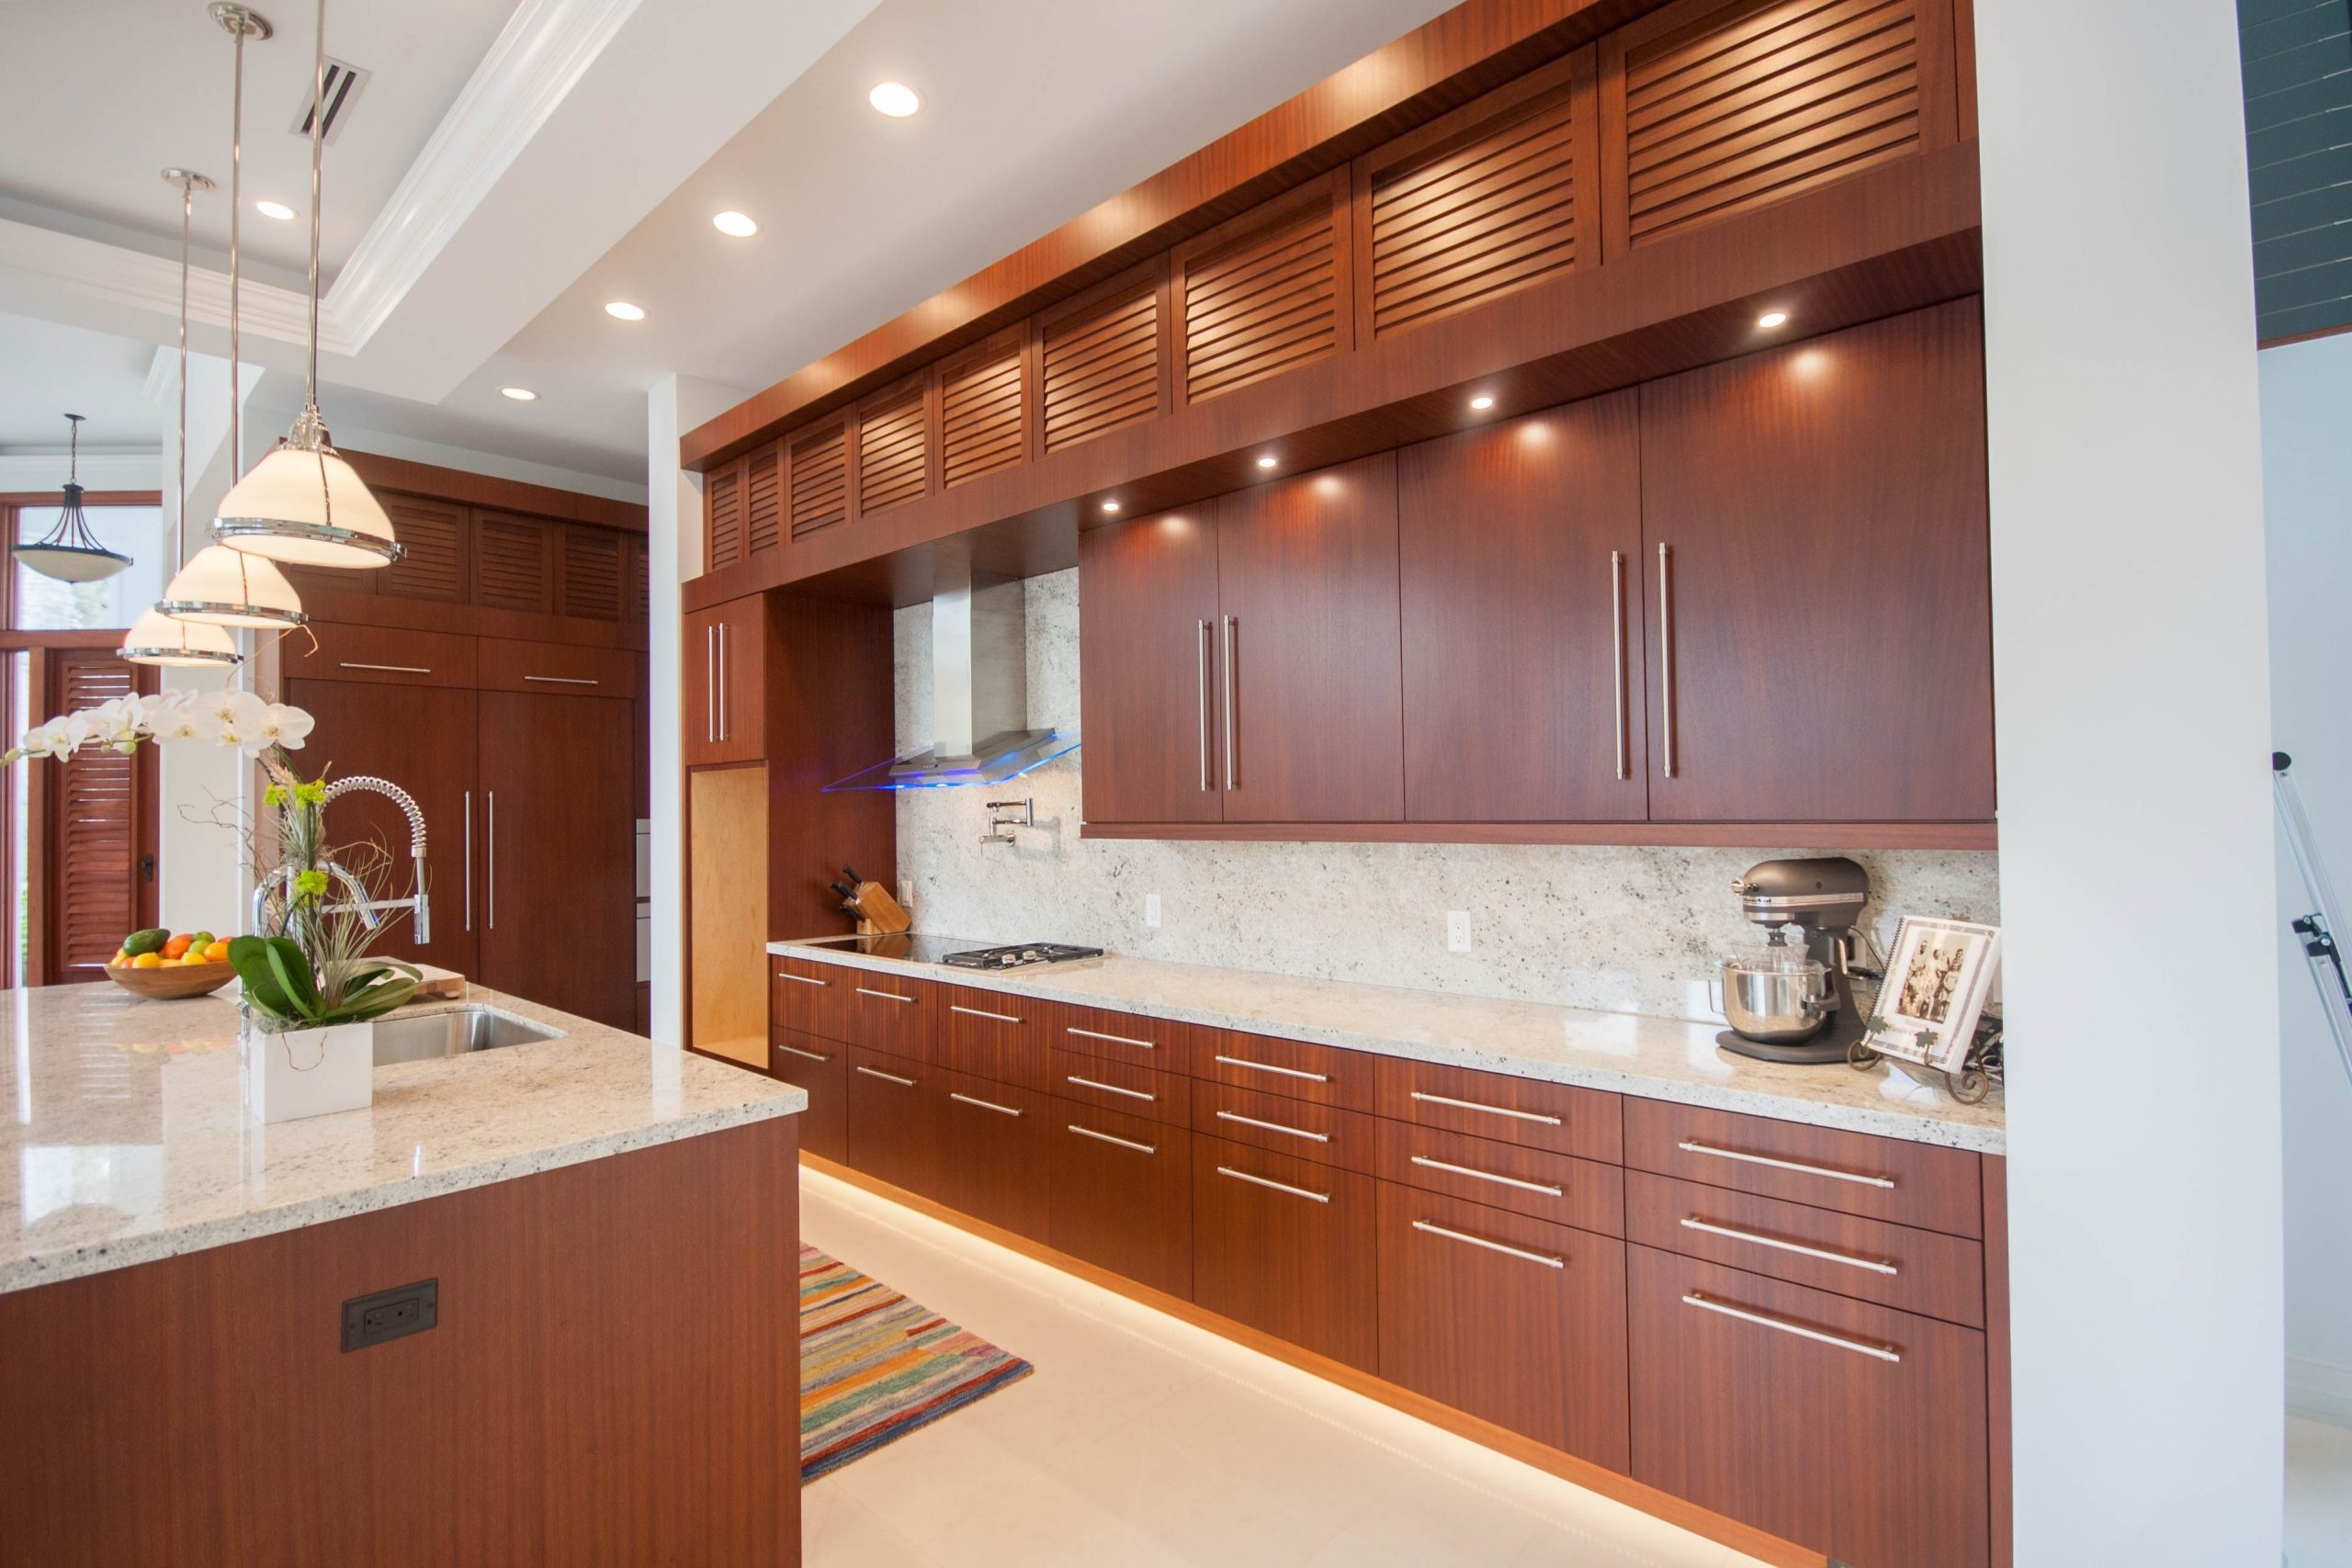 Custom Kitchen Cabinets Jupiter Fl - Iwn Kitchen for Kitchen Remodeling Jupiter Florida